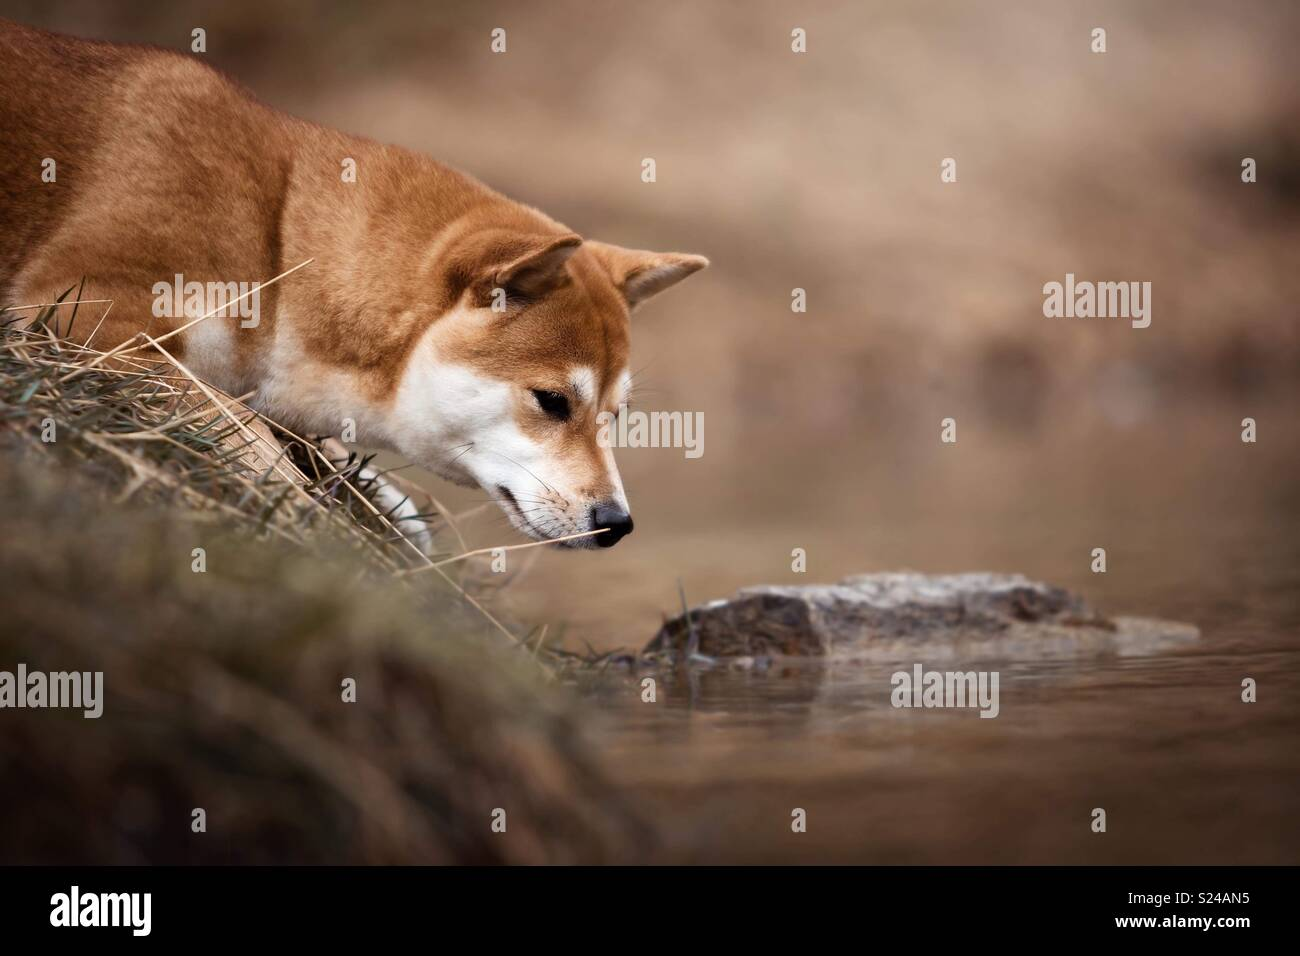 Frösche & Hunde Stockbild